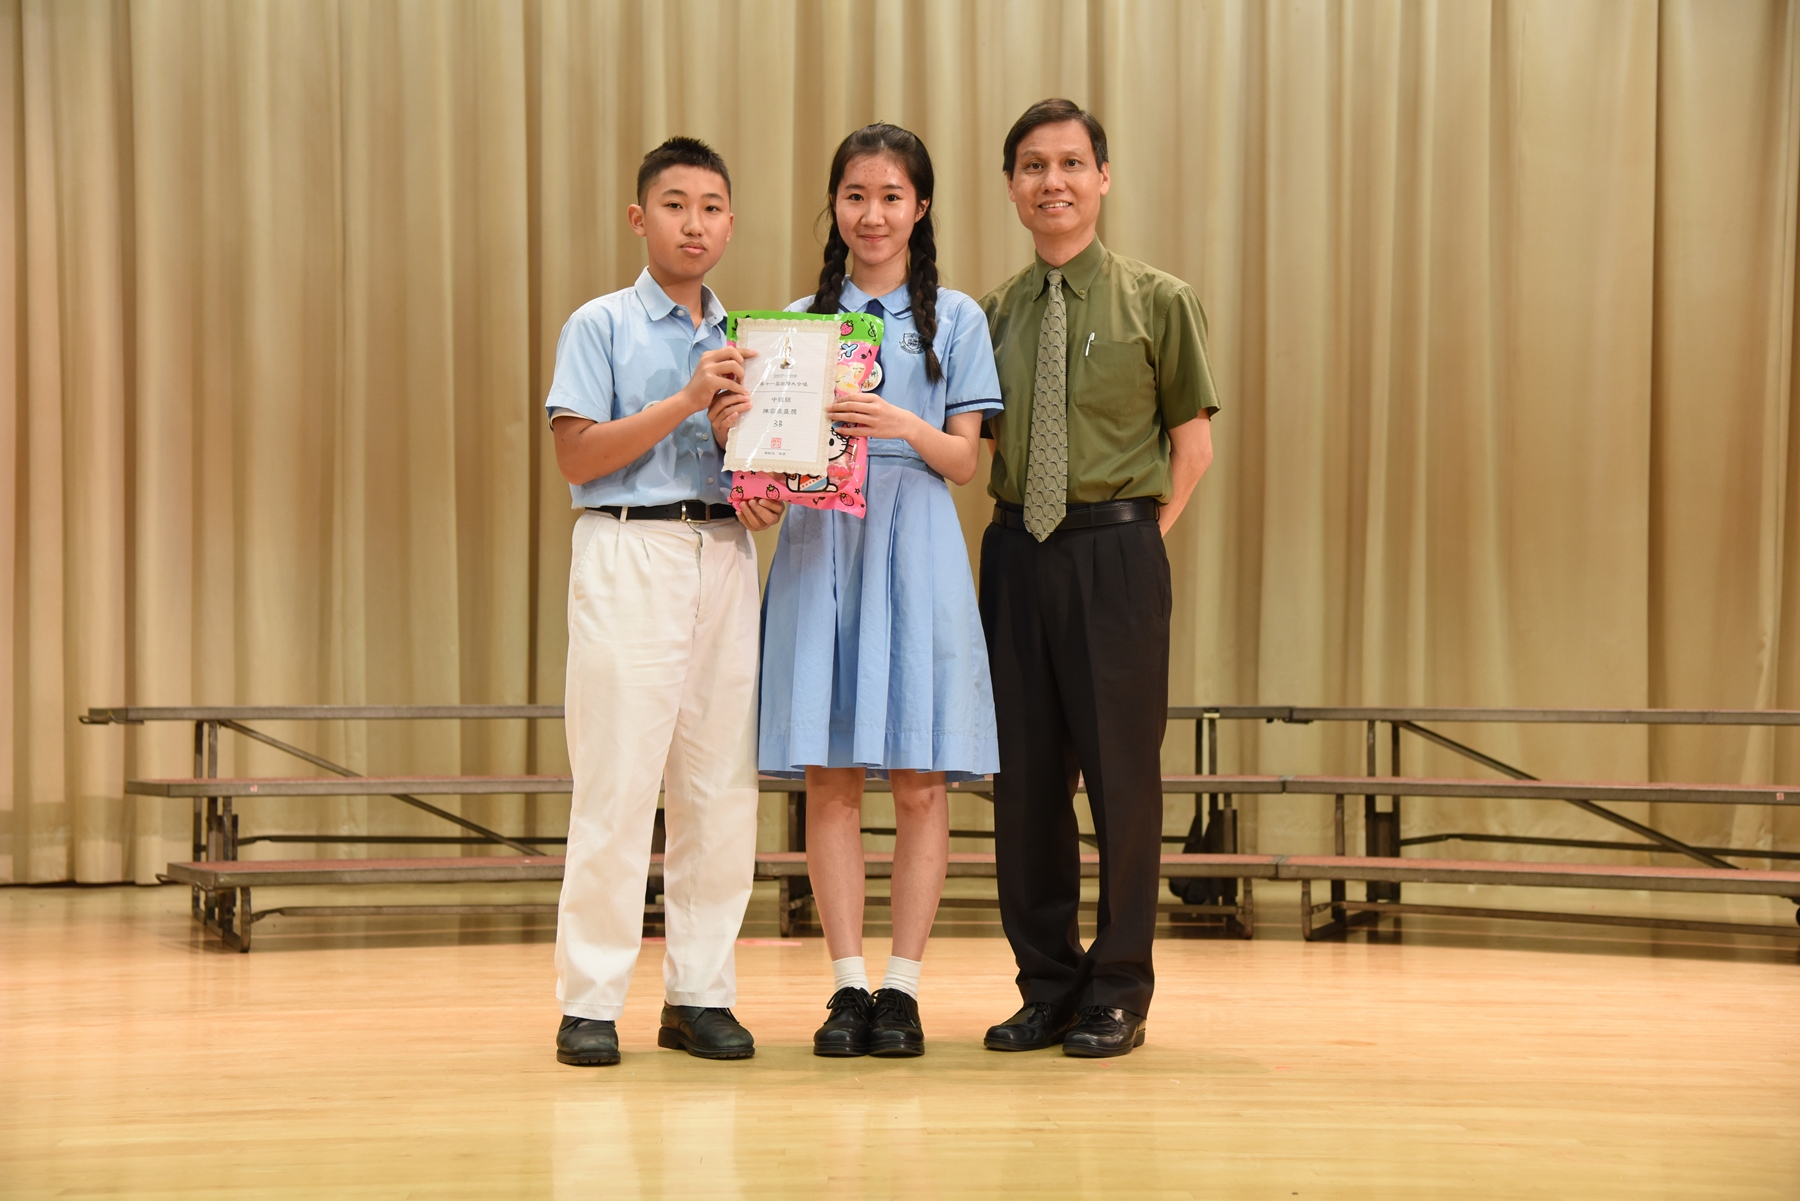 http://npc.edu.hk/sites/default/files/dsc_3424.jpg